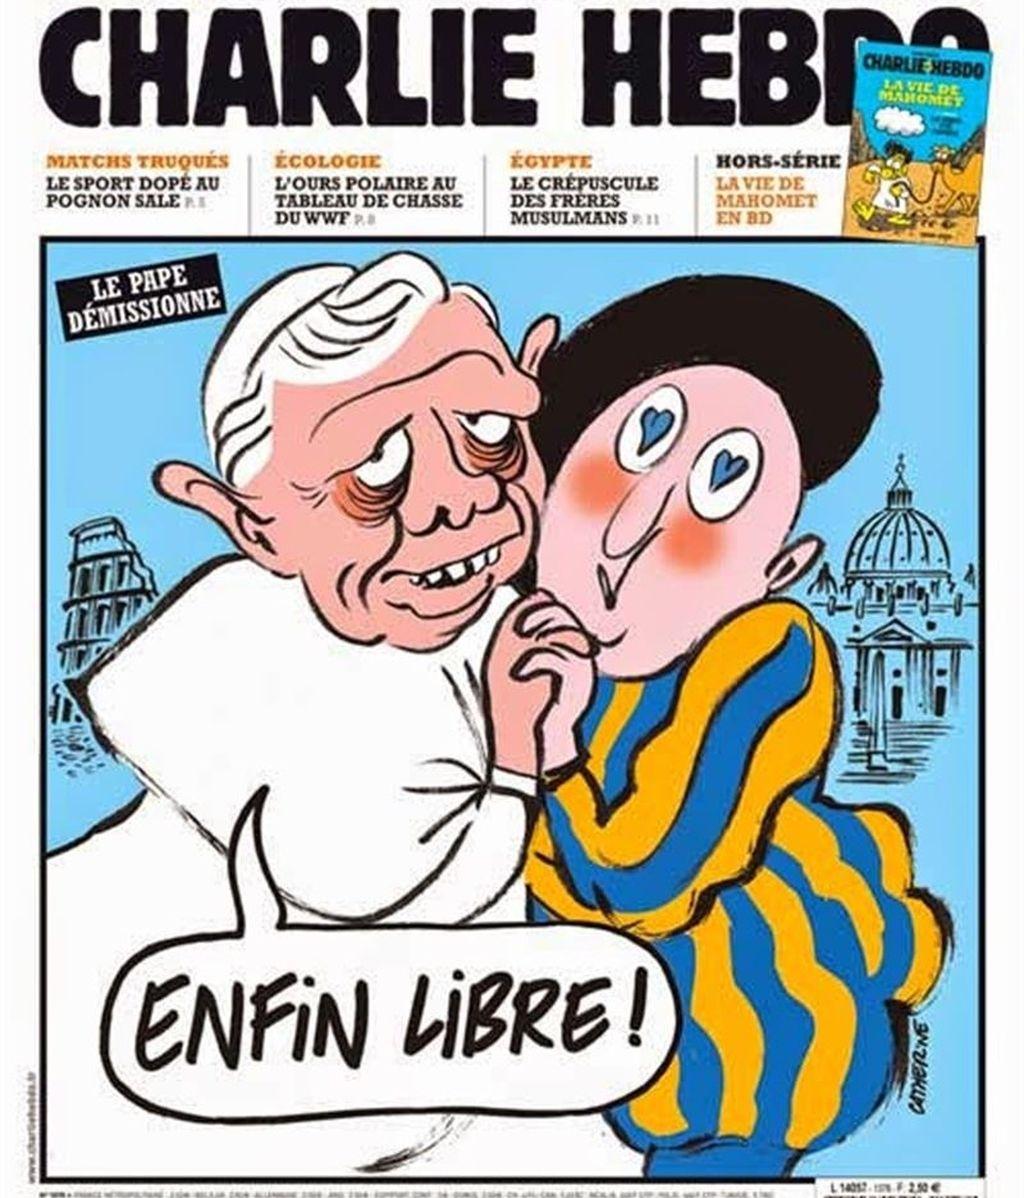 El Papa Benedicto XVI, objeto de burla